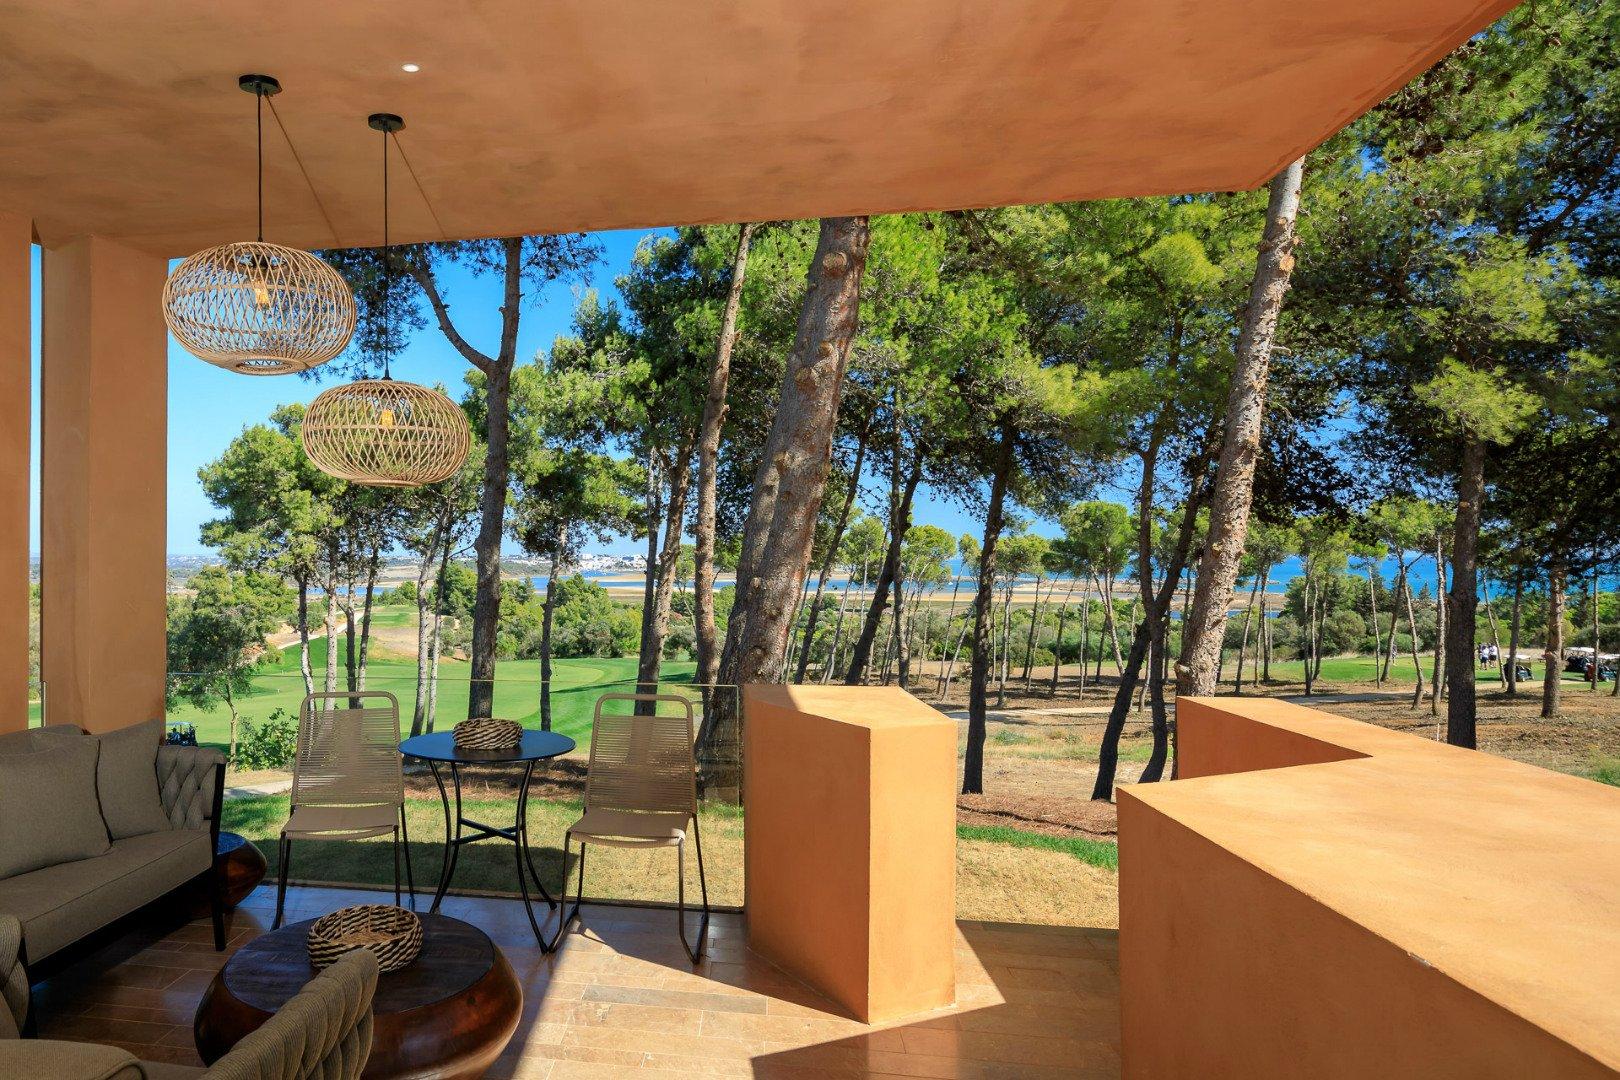 2 Bedroom Apartment Lagos, Western Algarve Ref: GA378C